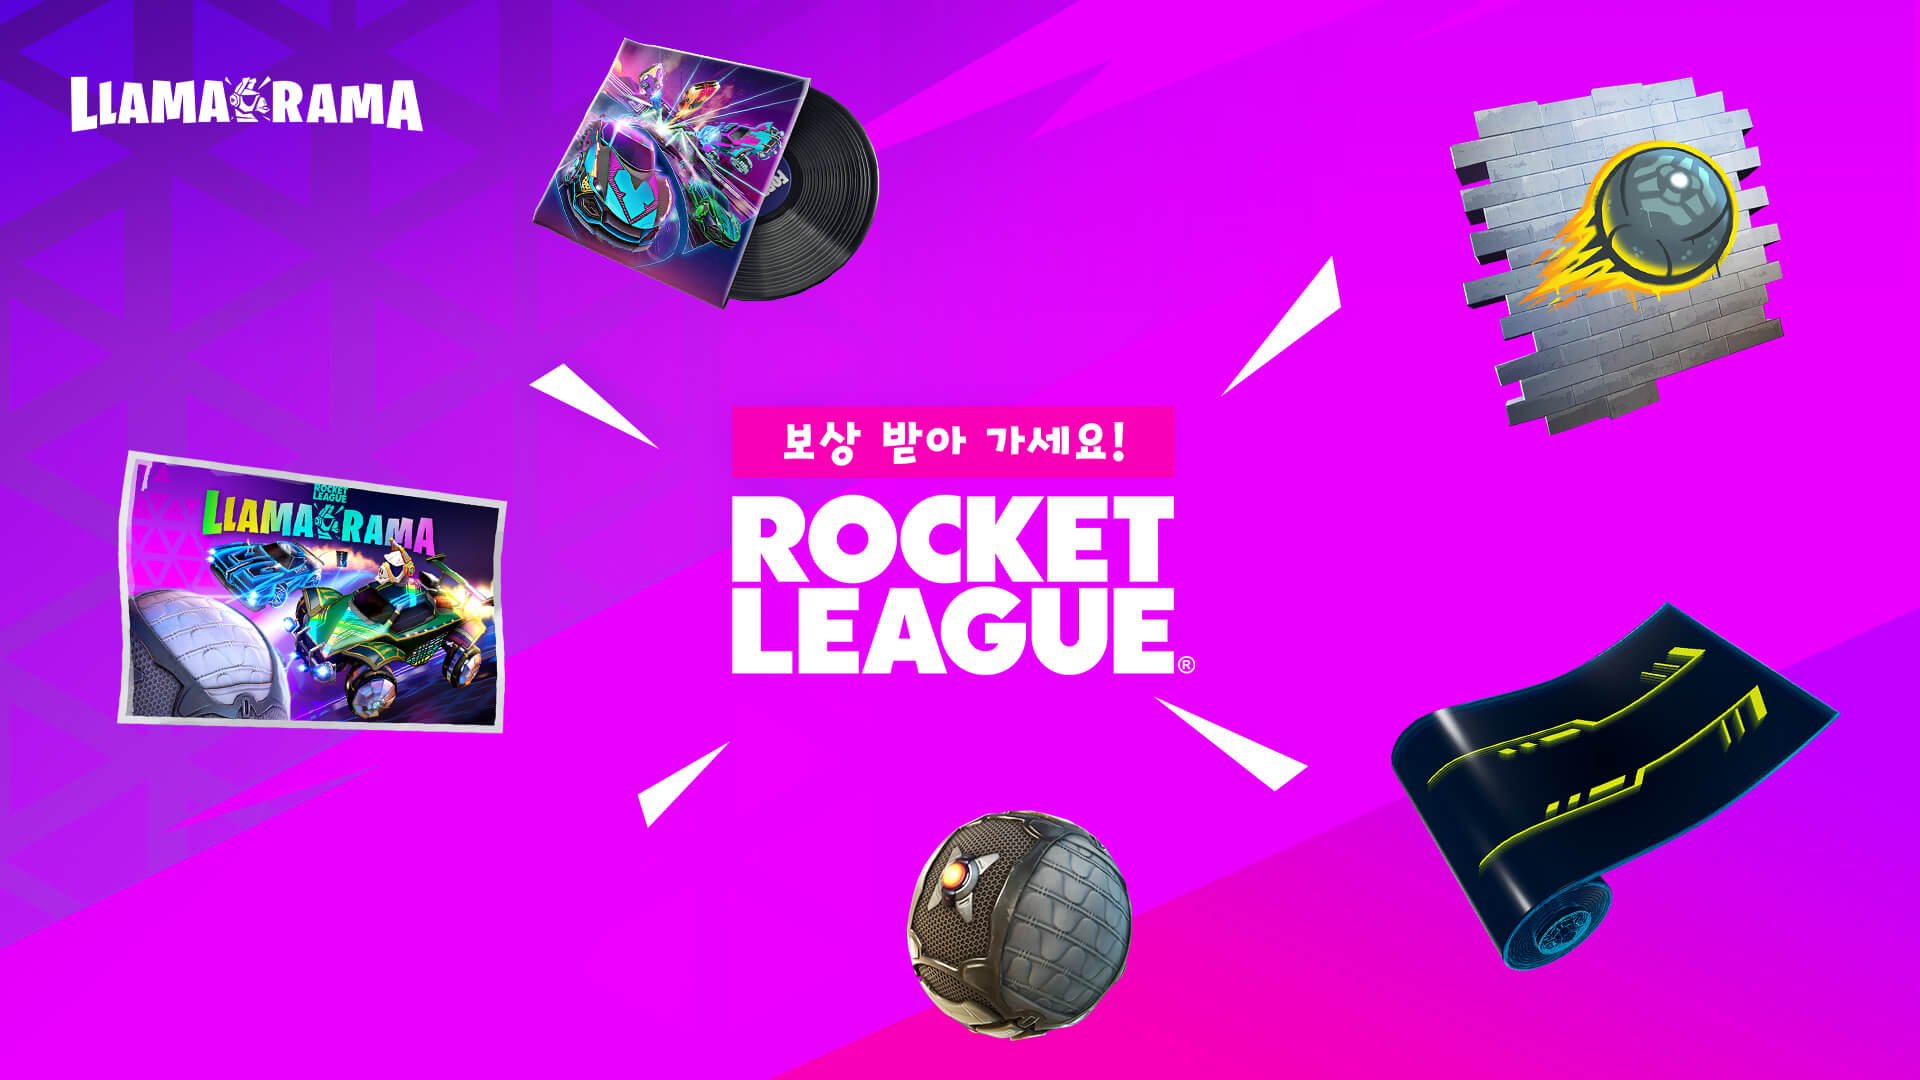 KR 16BR RocketLeague Llama Rama Rewards V2 Social